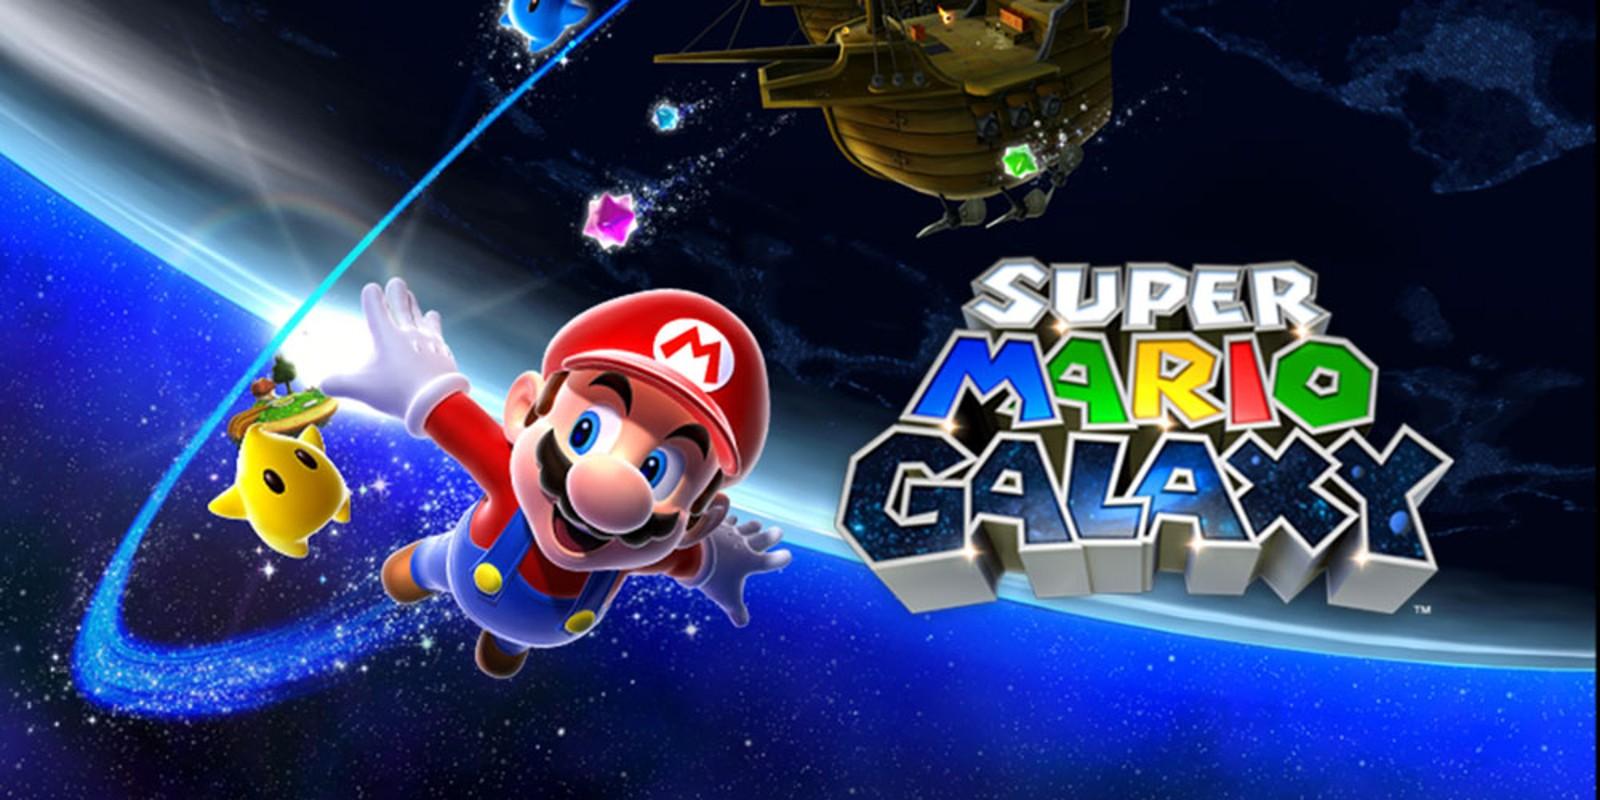 The Legend Of Zelda Wallpaper Hd Super Mario Galaxy Wii Games Nintendo